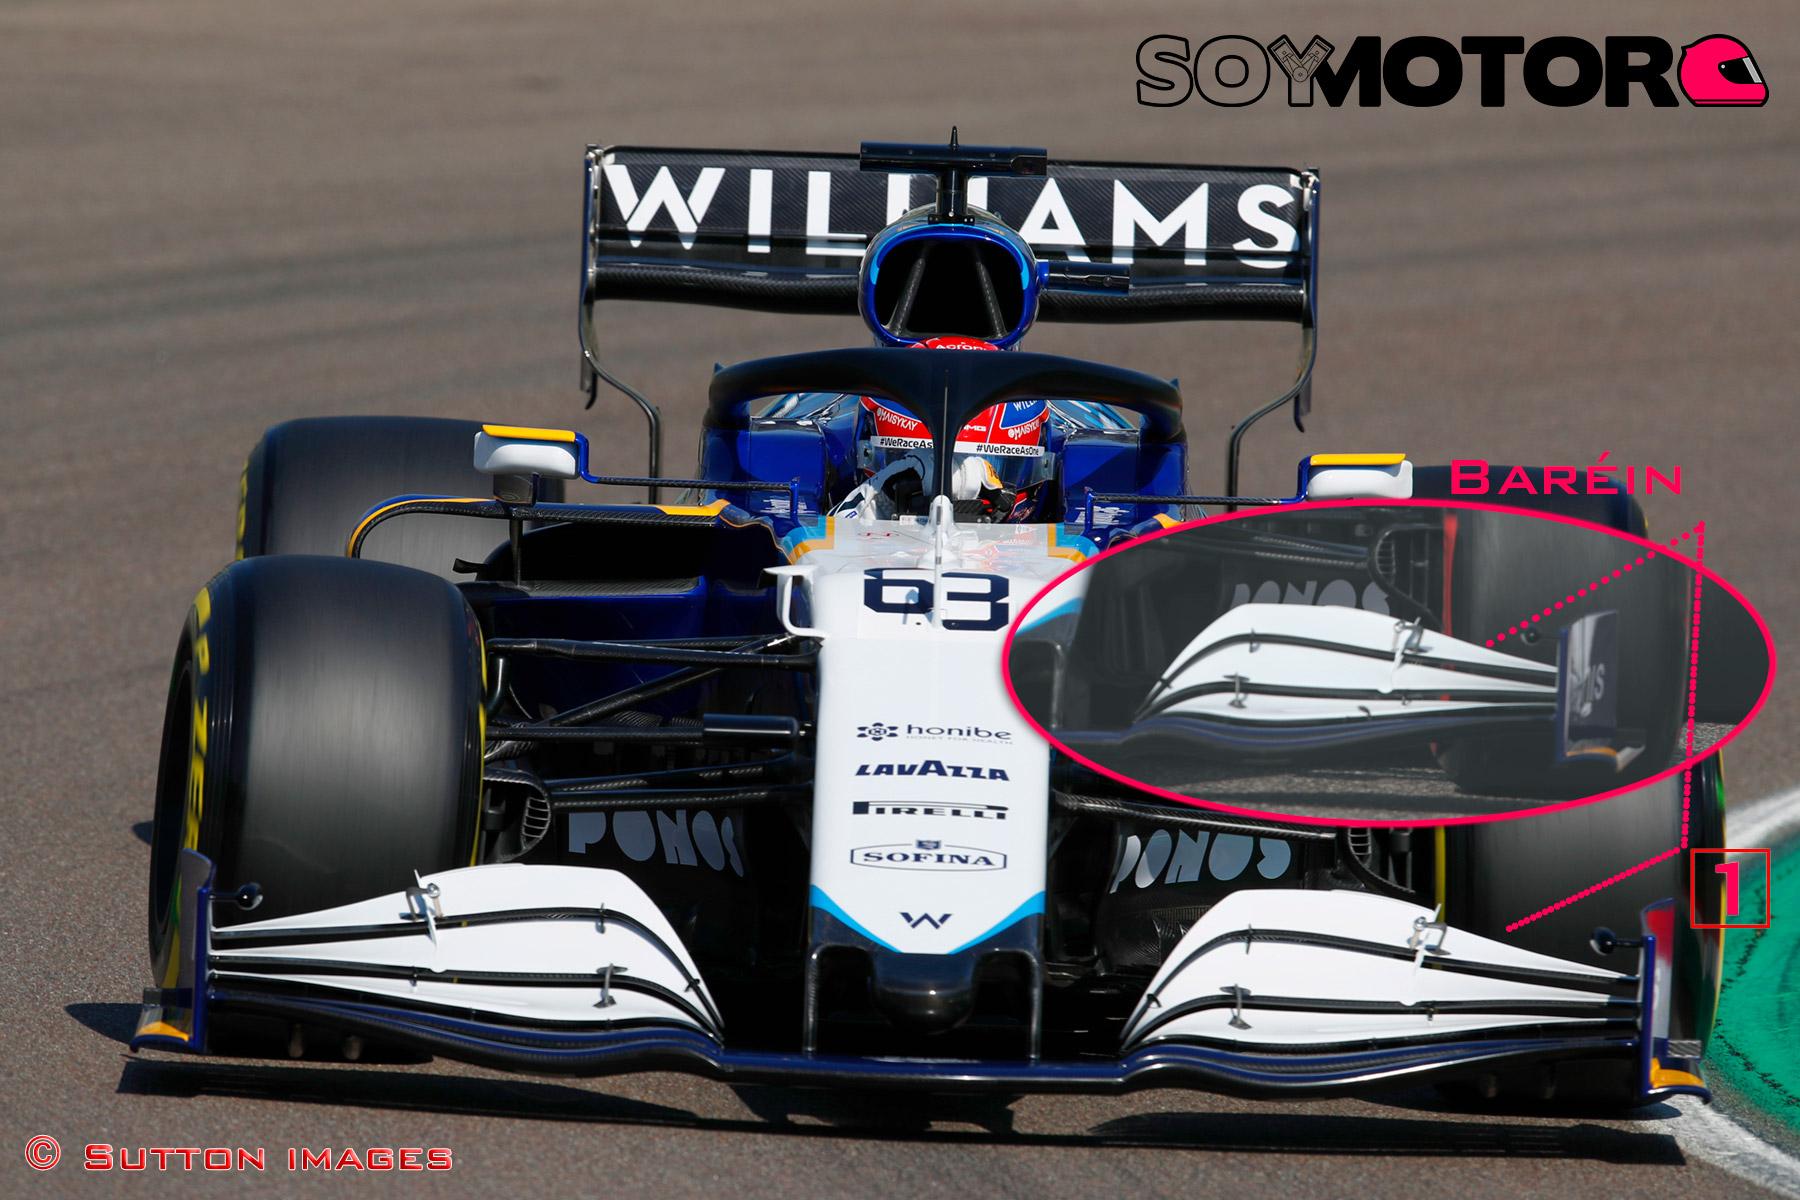 williams-nueva-ala-delantera-soymotor_0.jpg